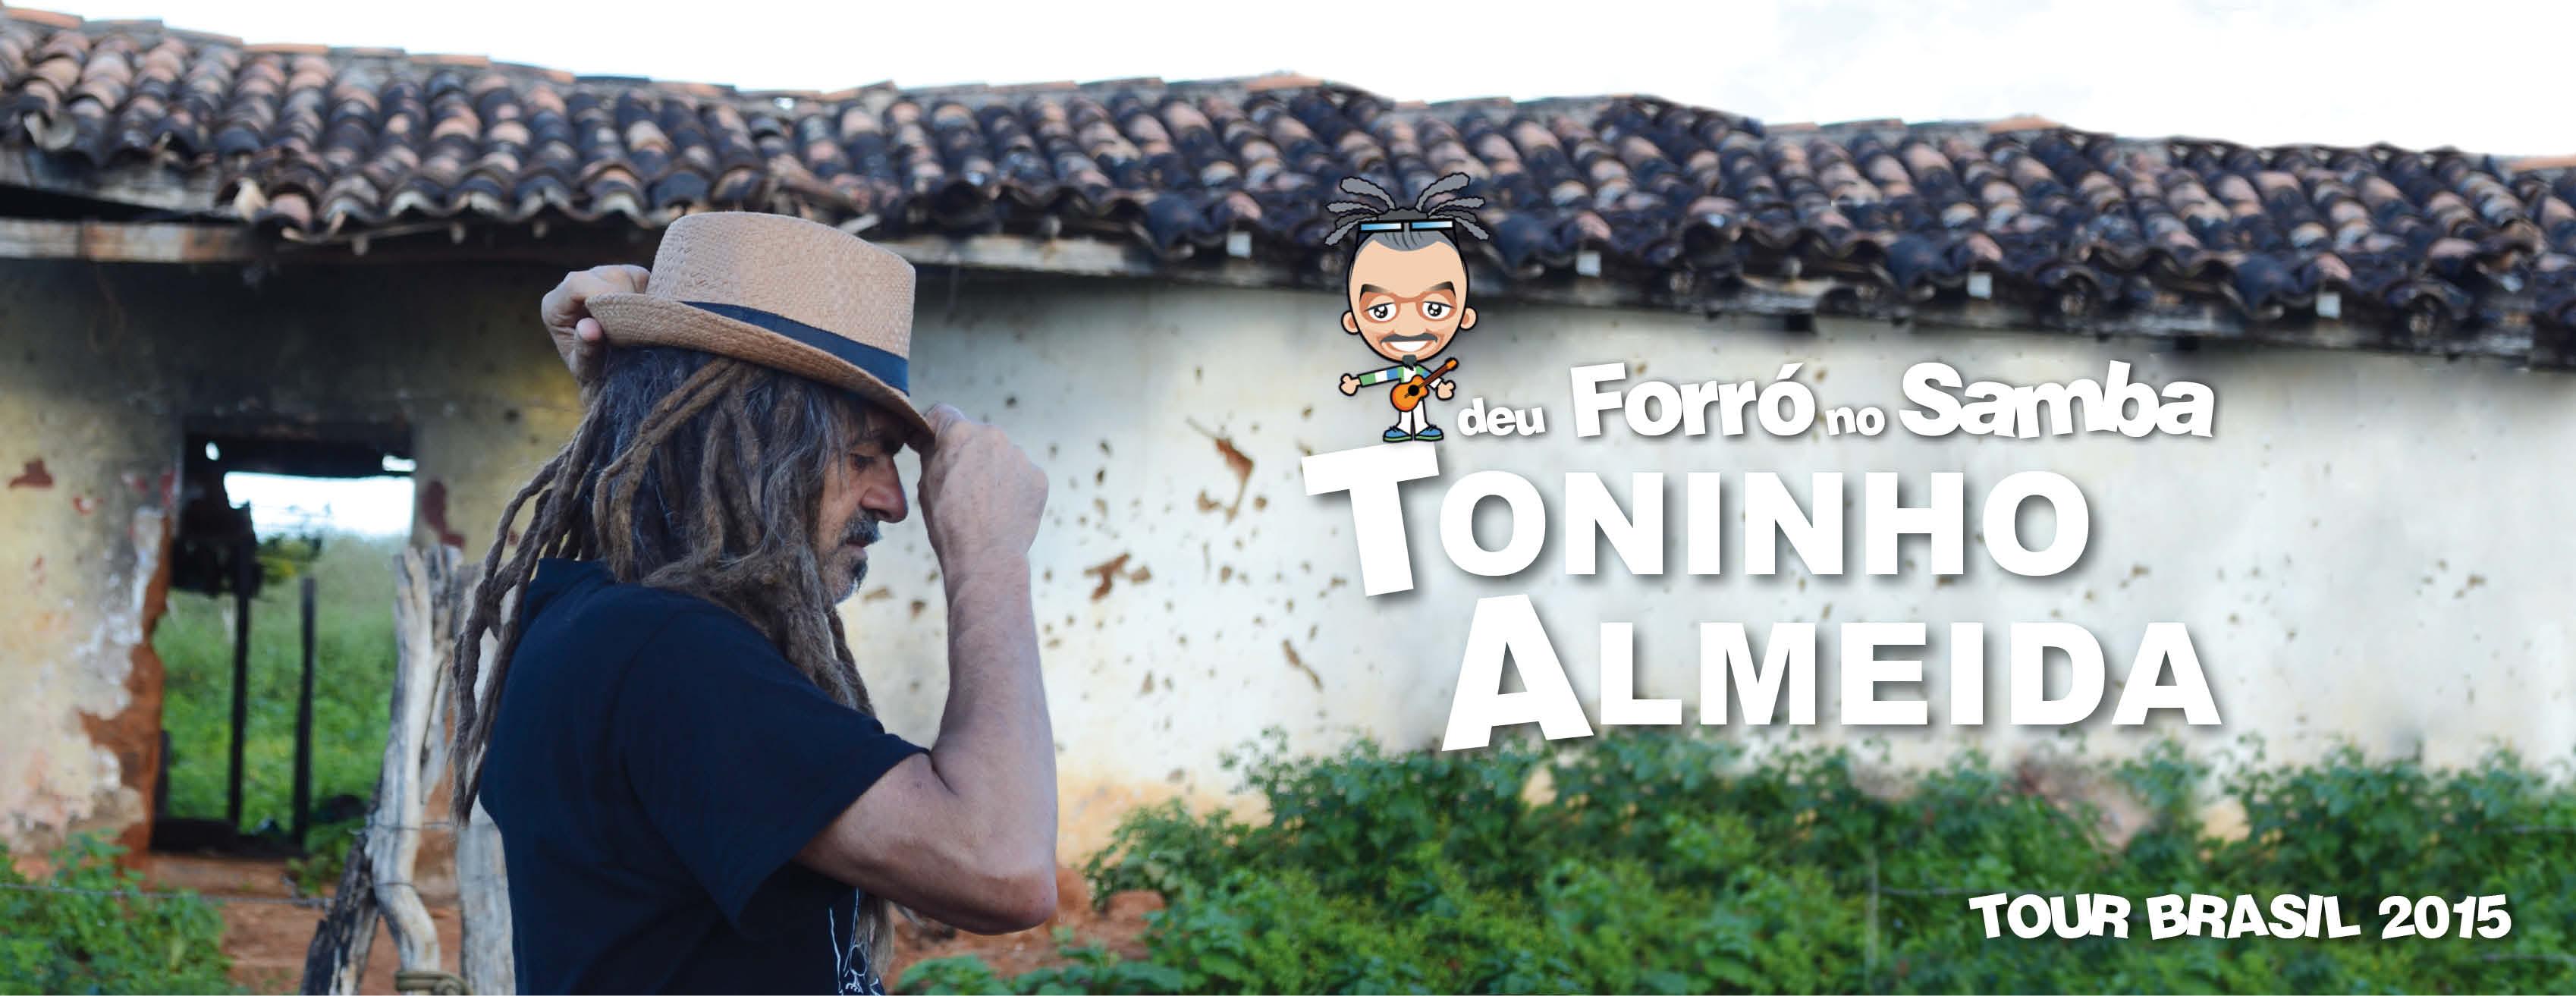 Toninho Almeida Tour Brasil Begin !